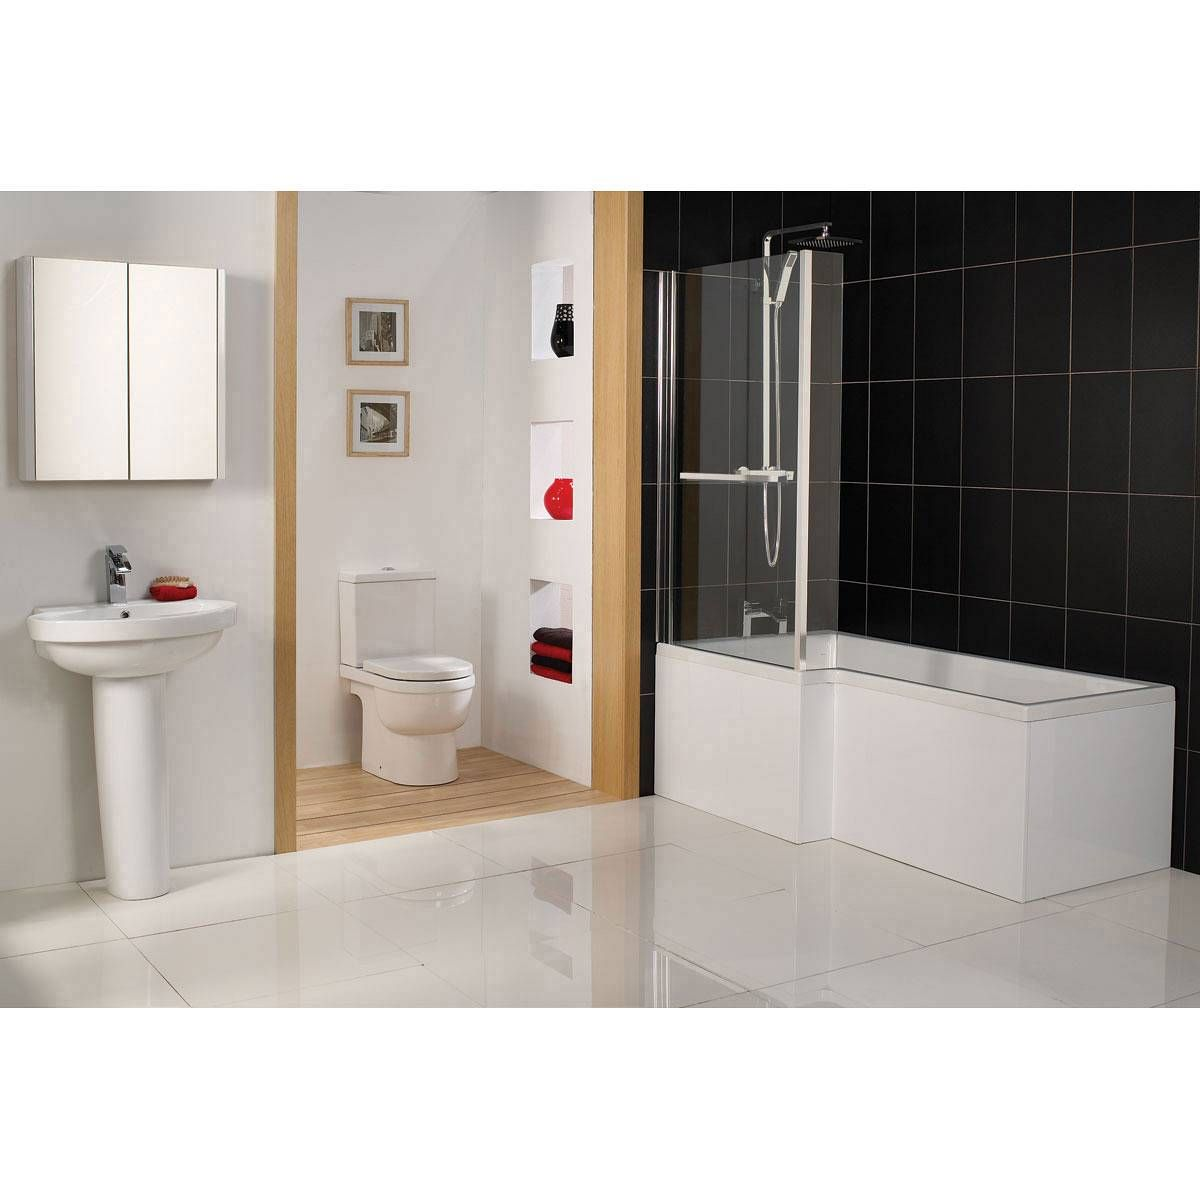 Cambridge Square Shower Bath LH & Screen inc. Towel Rail - Now £209 ...